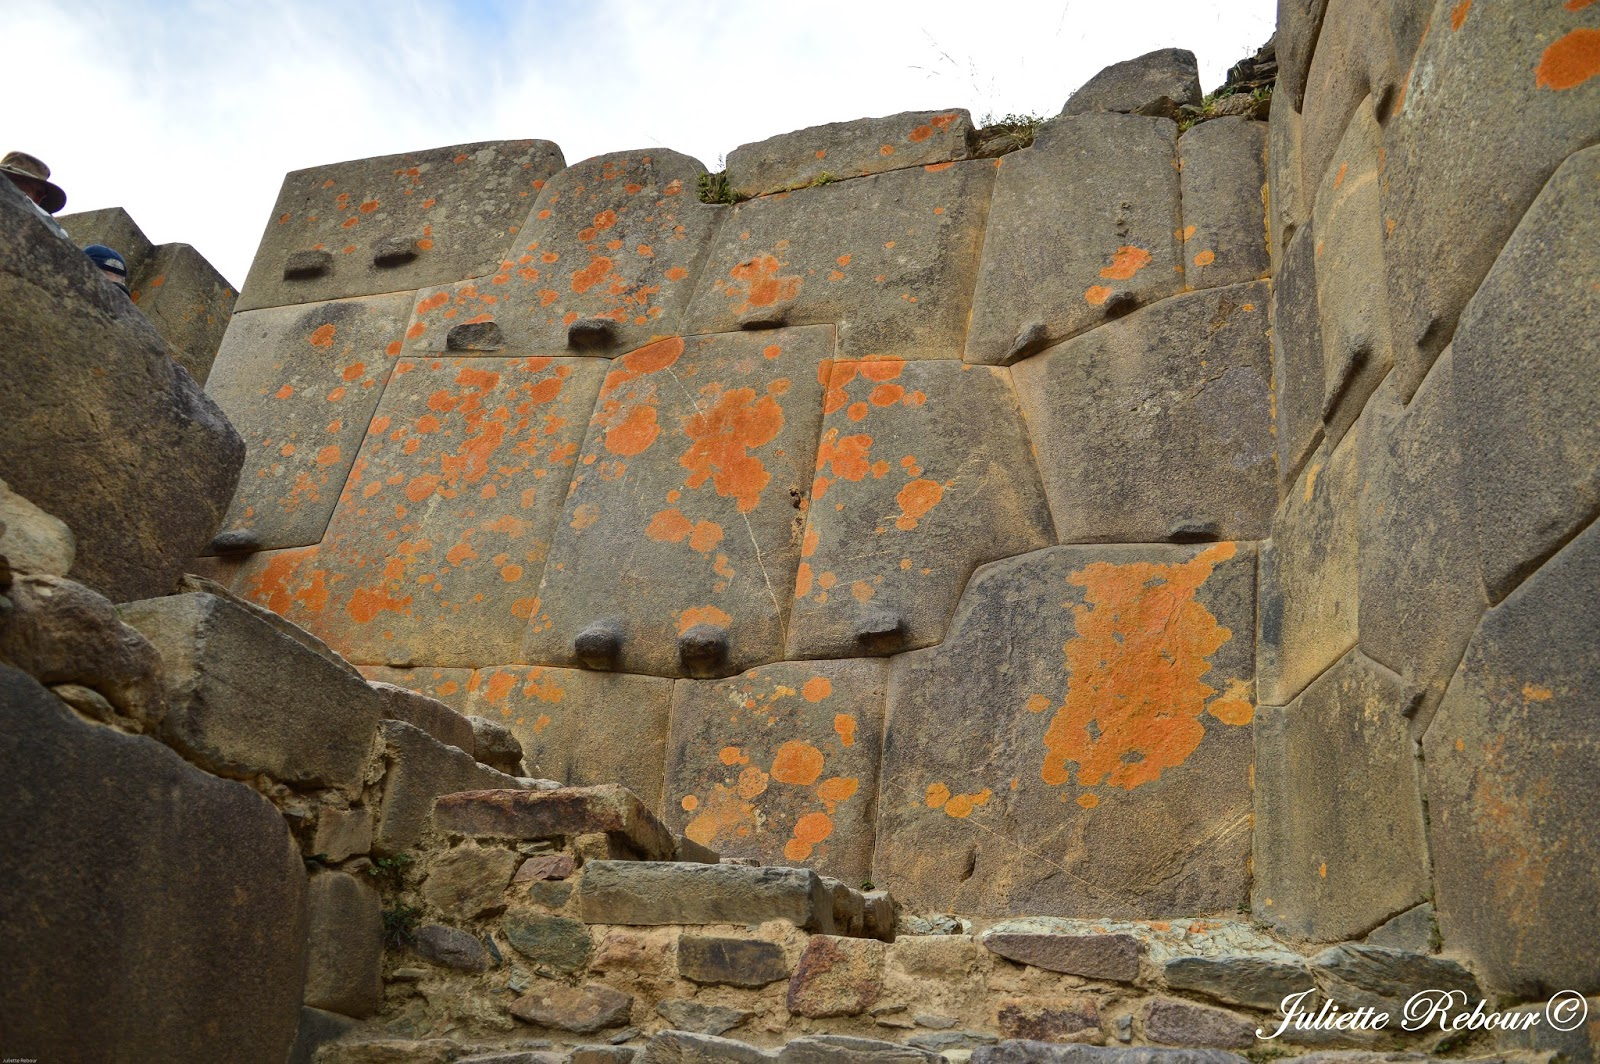 Pierres Incas à Ollantaytambo, Pérou